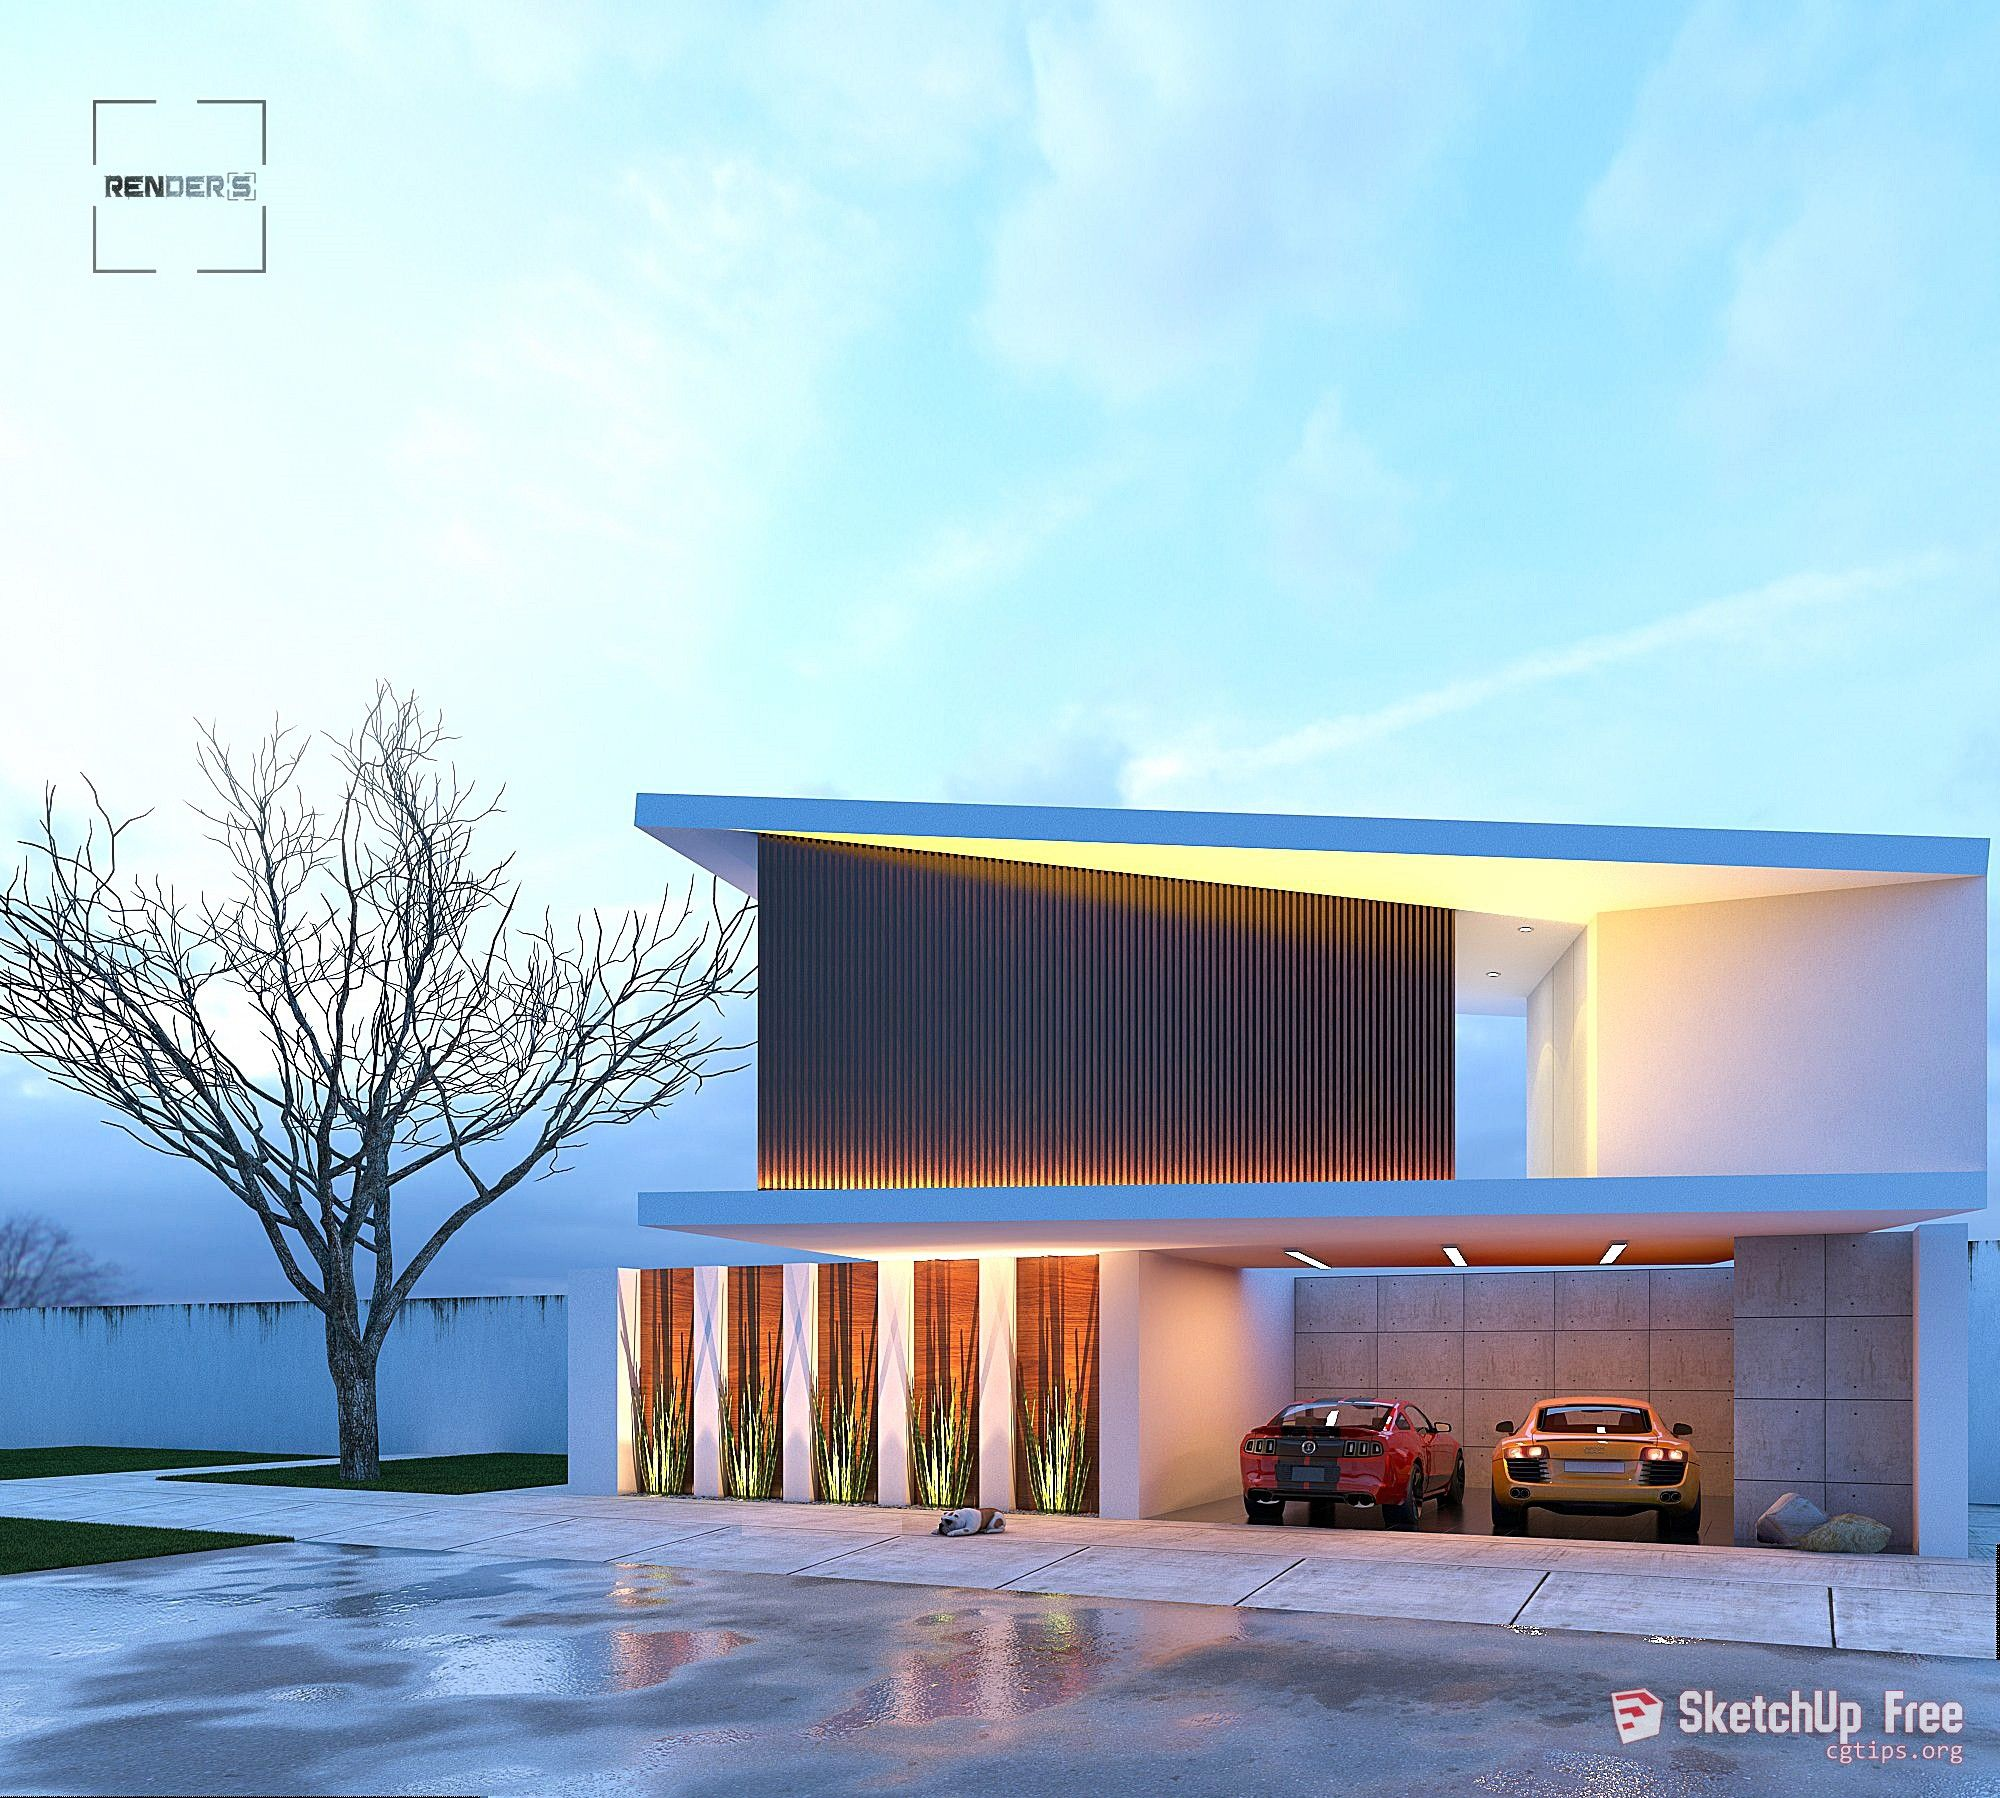 2037 Exterior Scene Sketchup Model Free Download | Sketchup